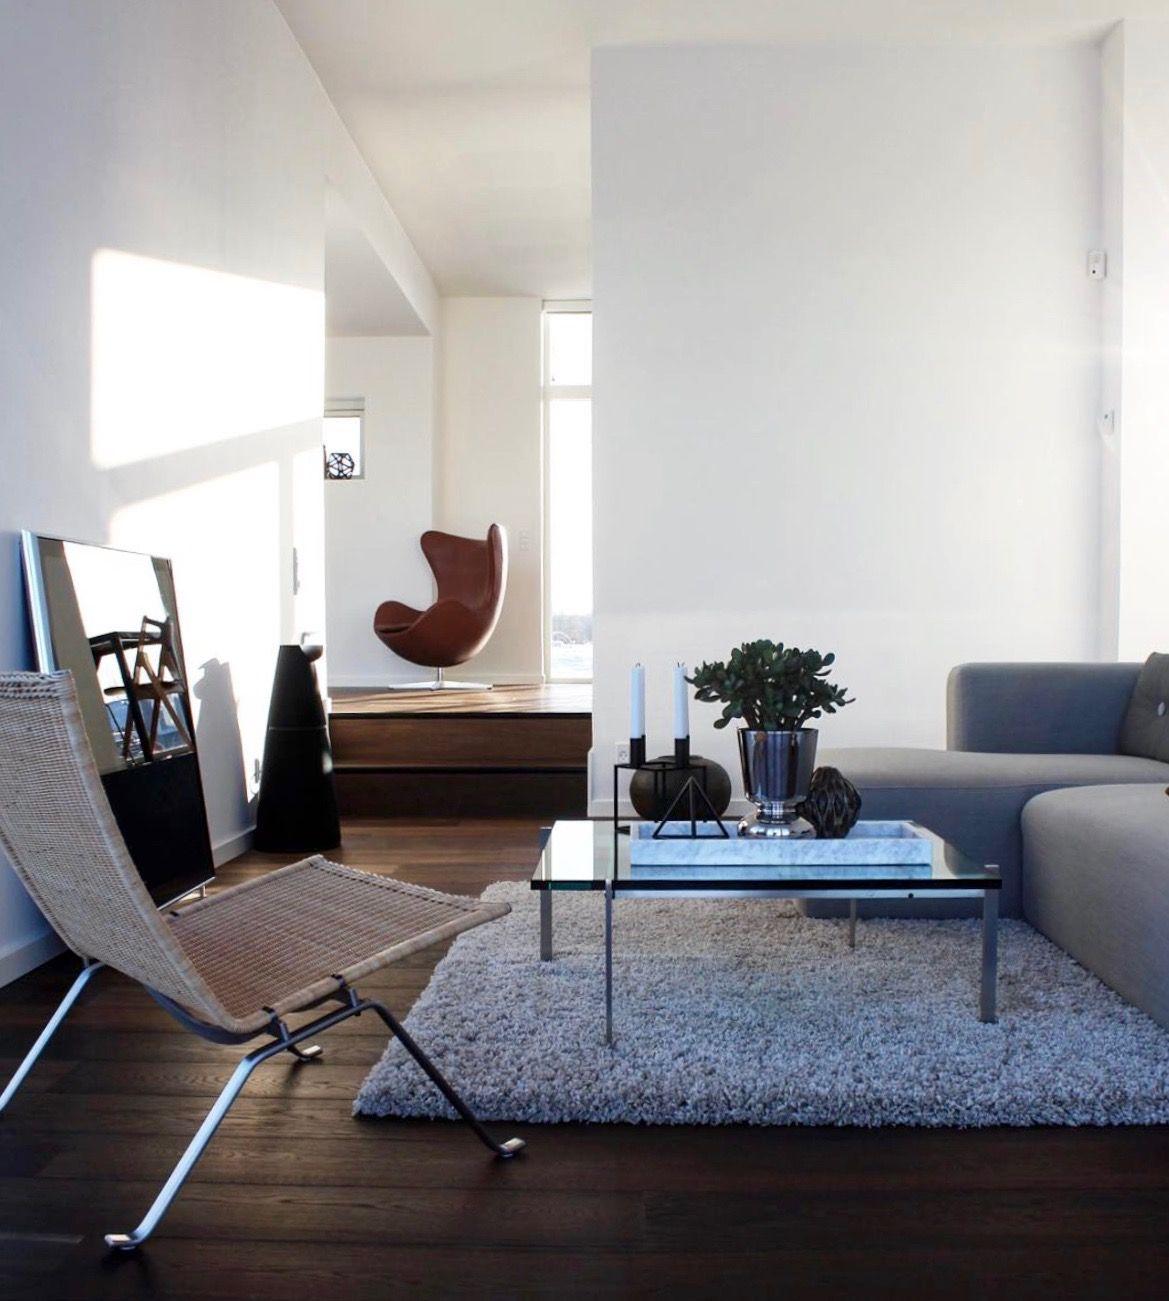 Bang & Olufsen Living Room shared by klintdrupp on Instagram ...